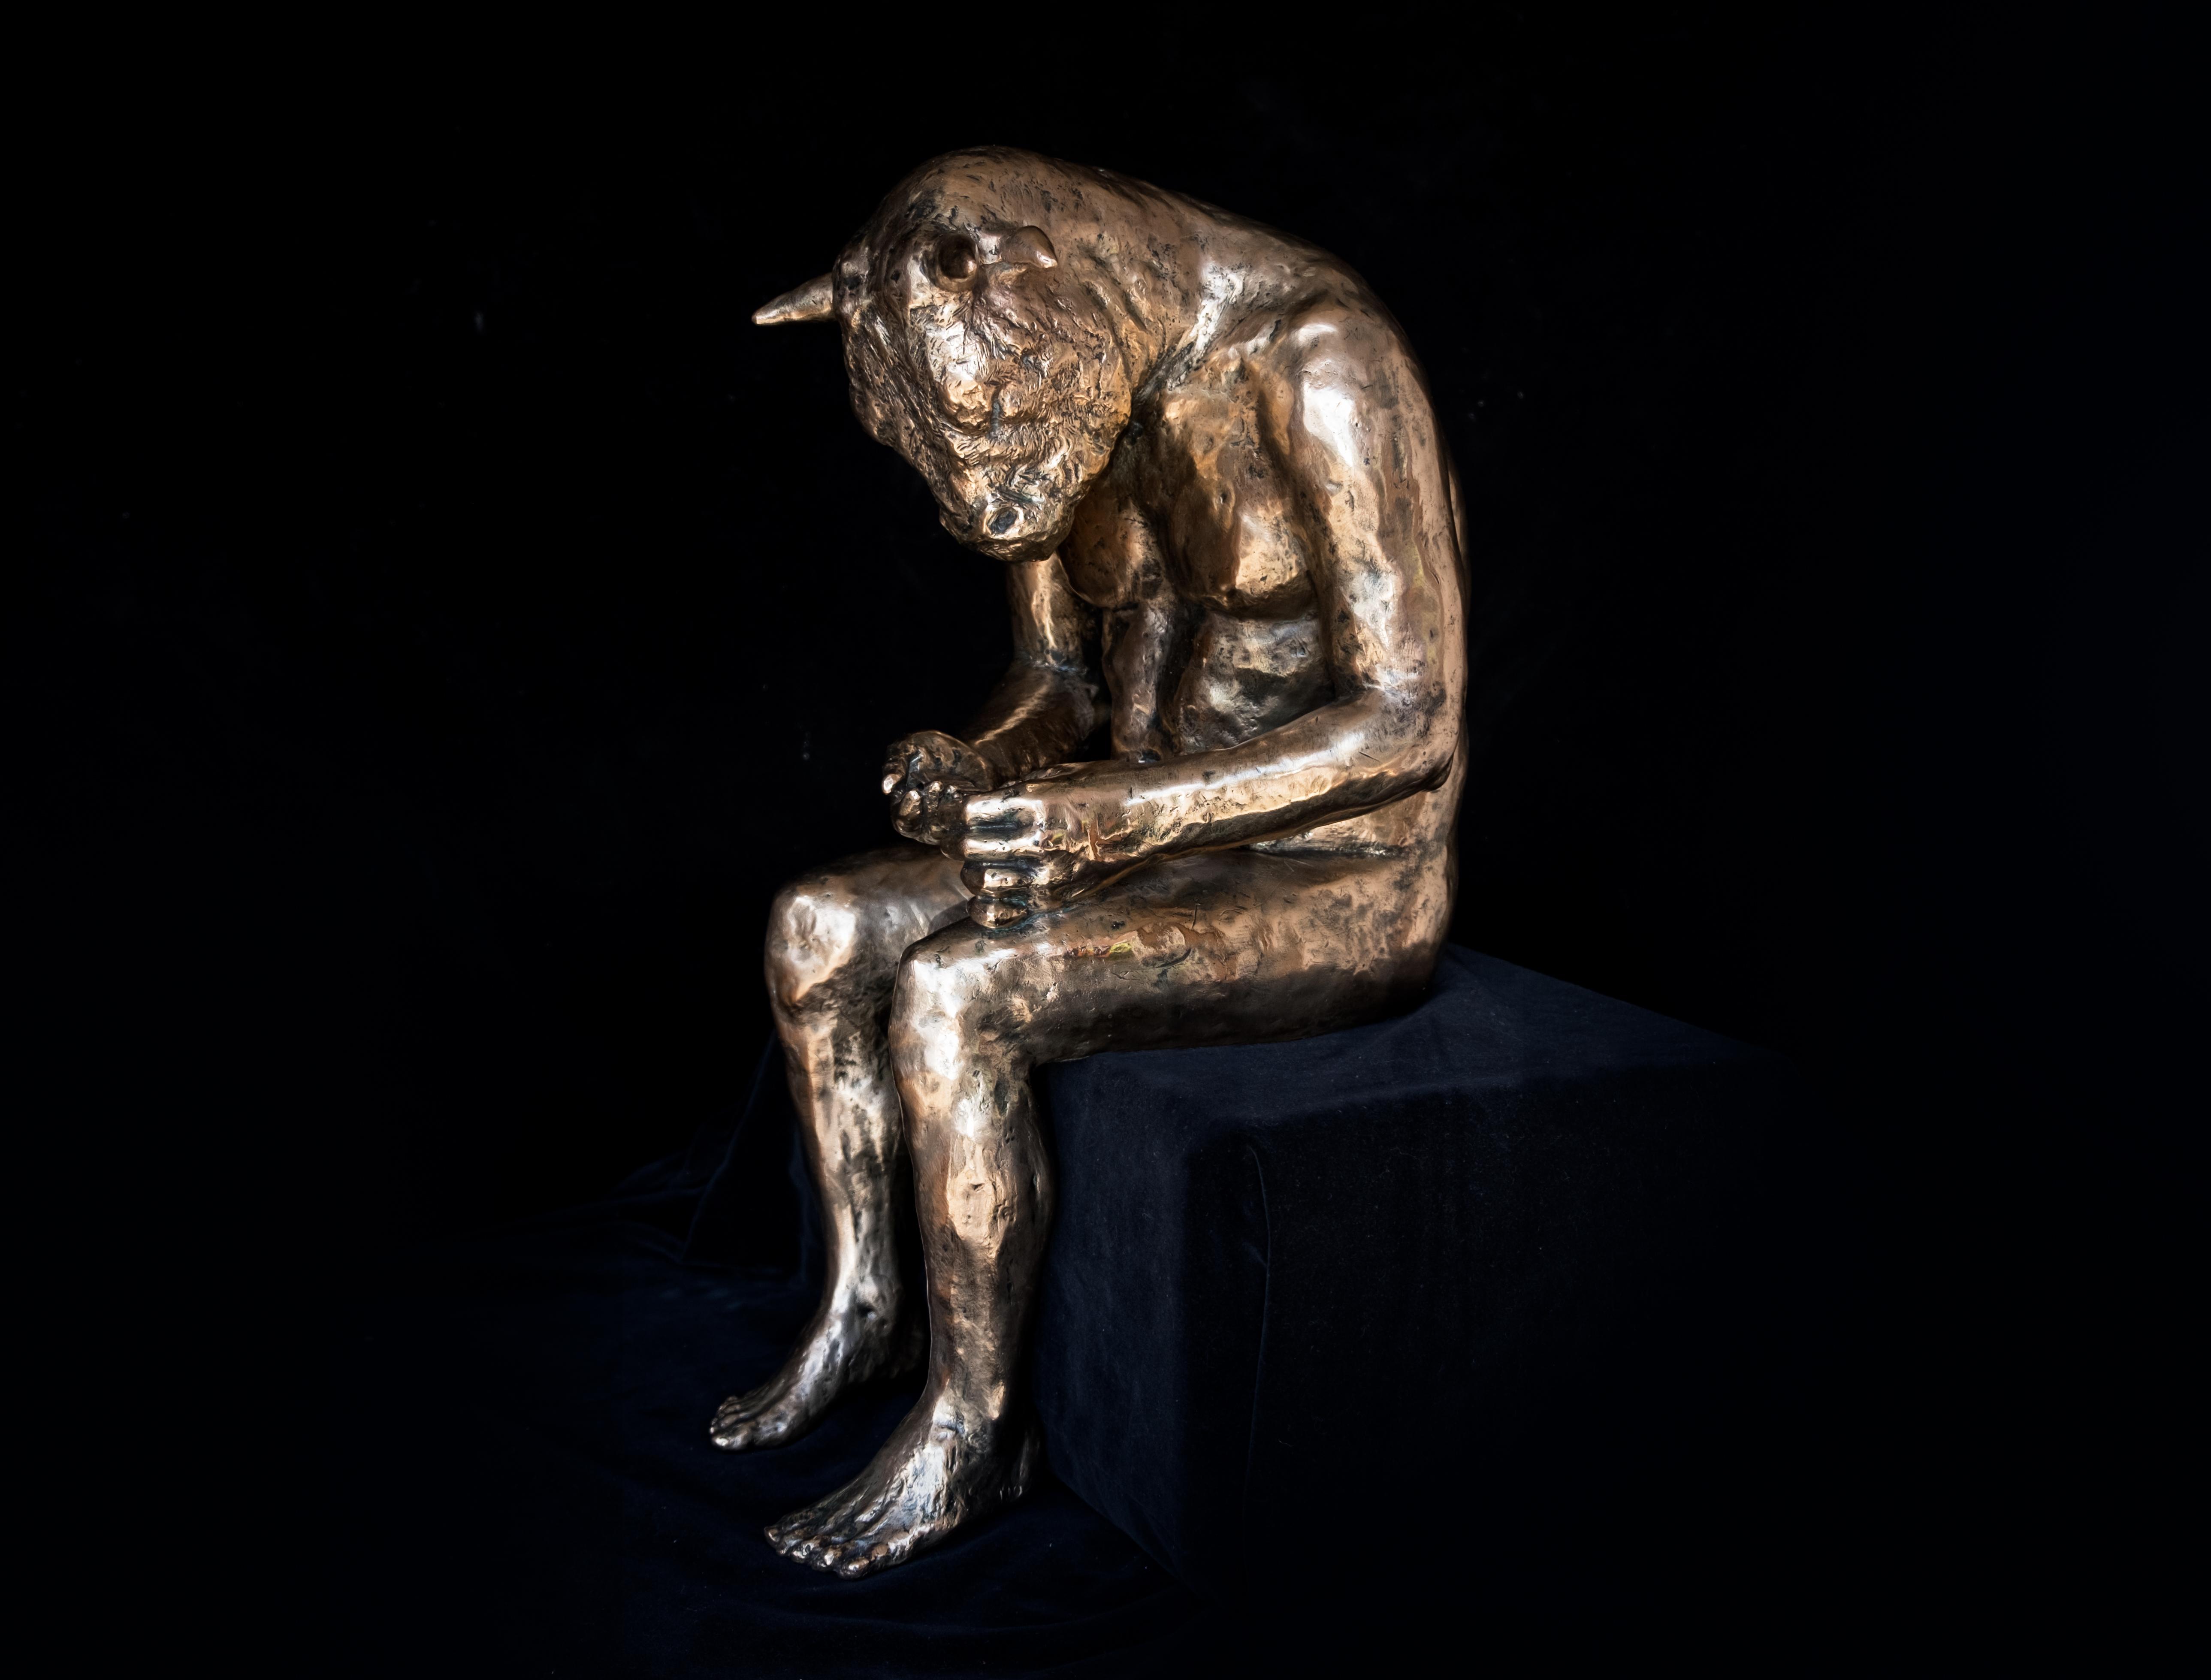 Minotaur - The golden thread - 10 November - 2 December